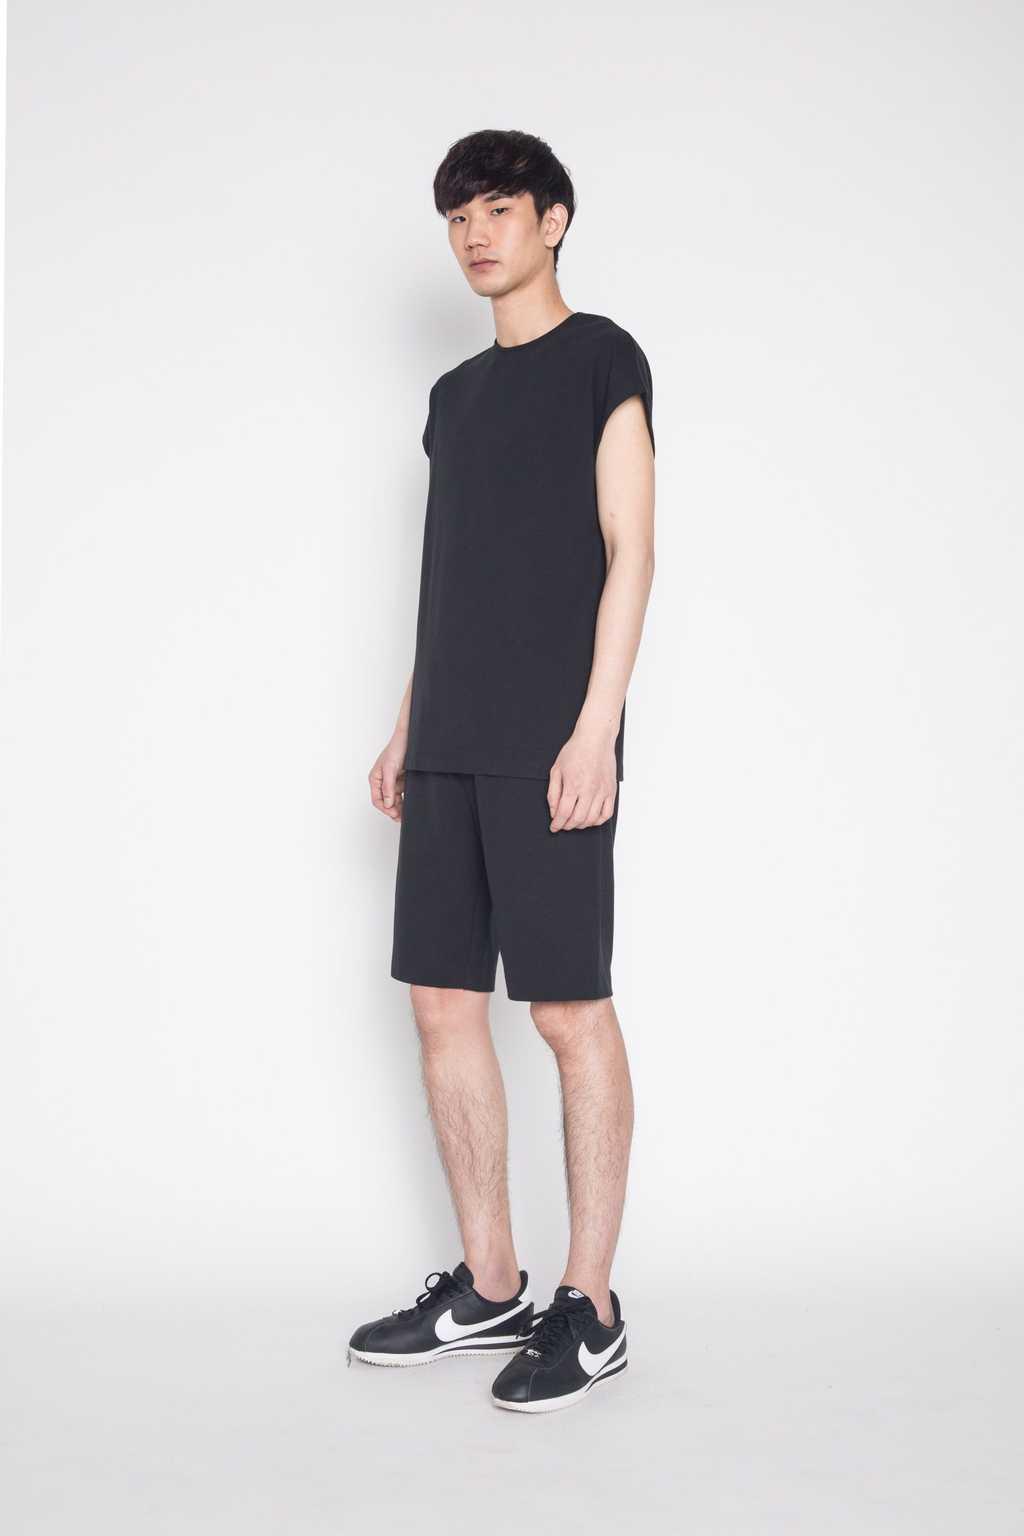 Sweatshirt 1229 Black 3